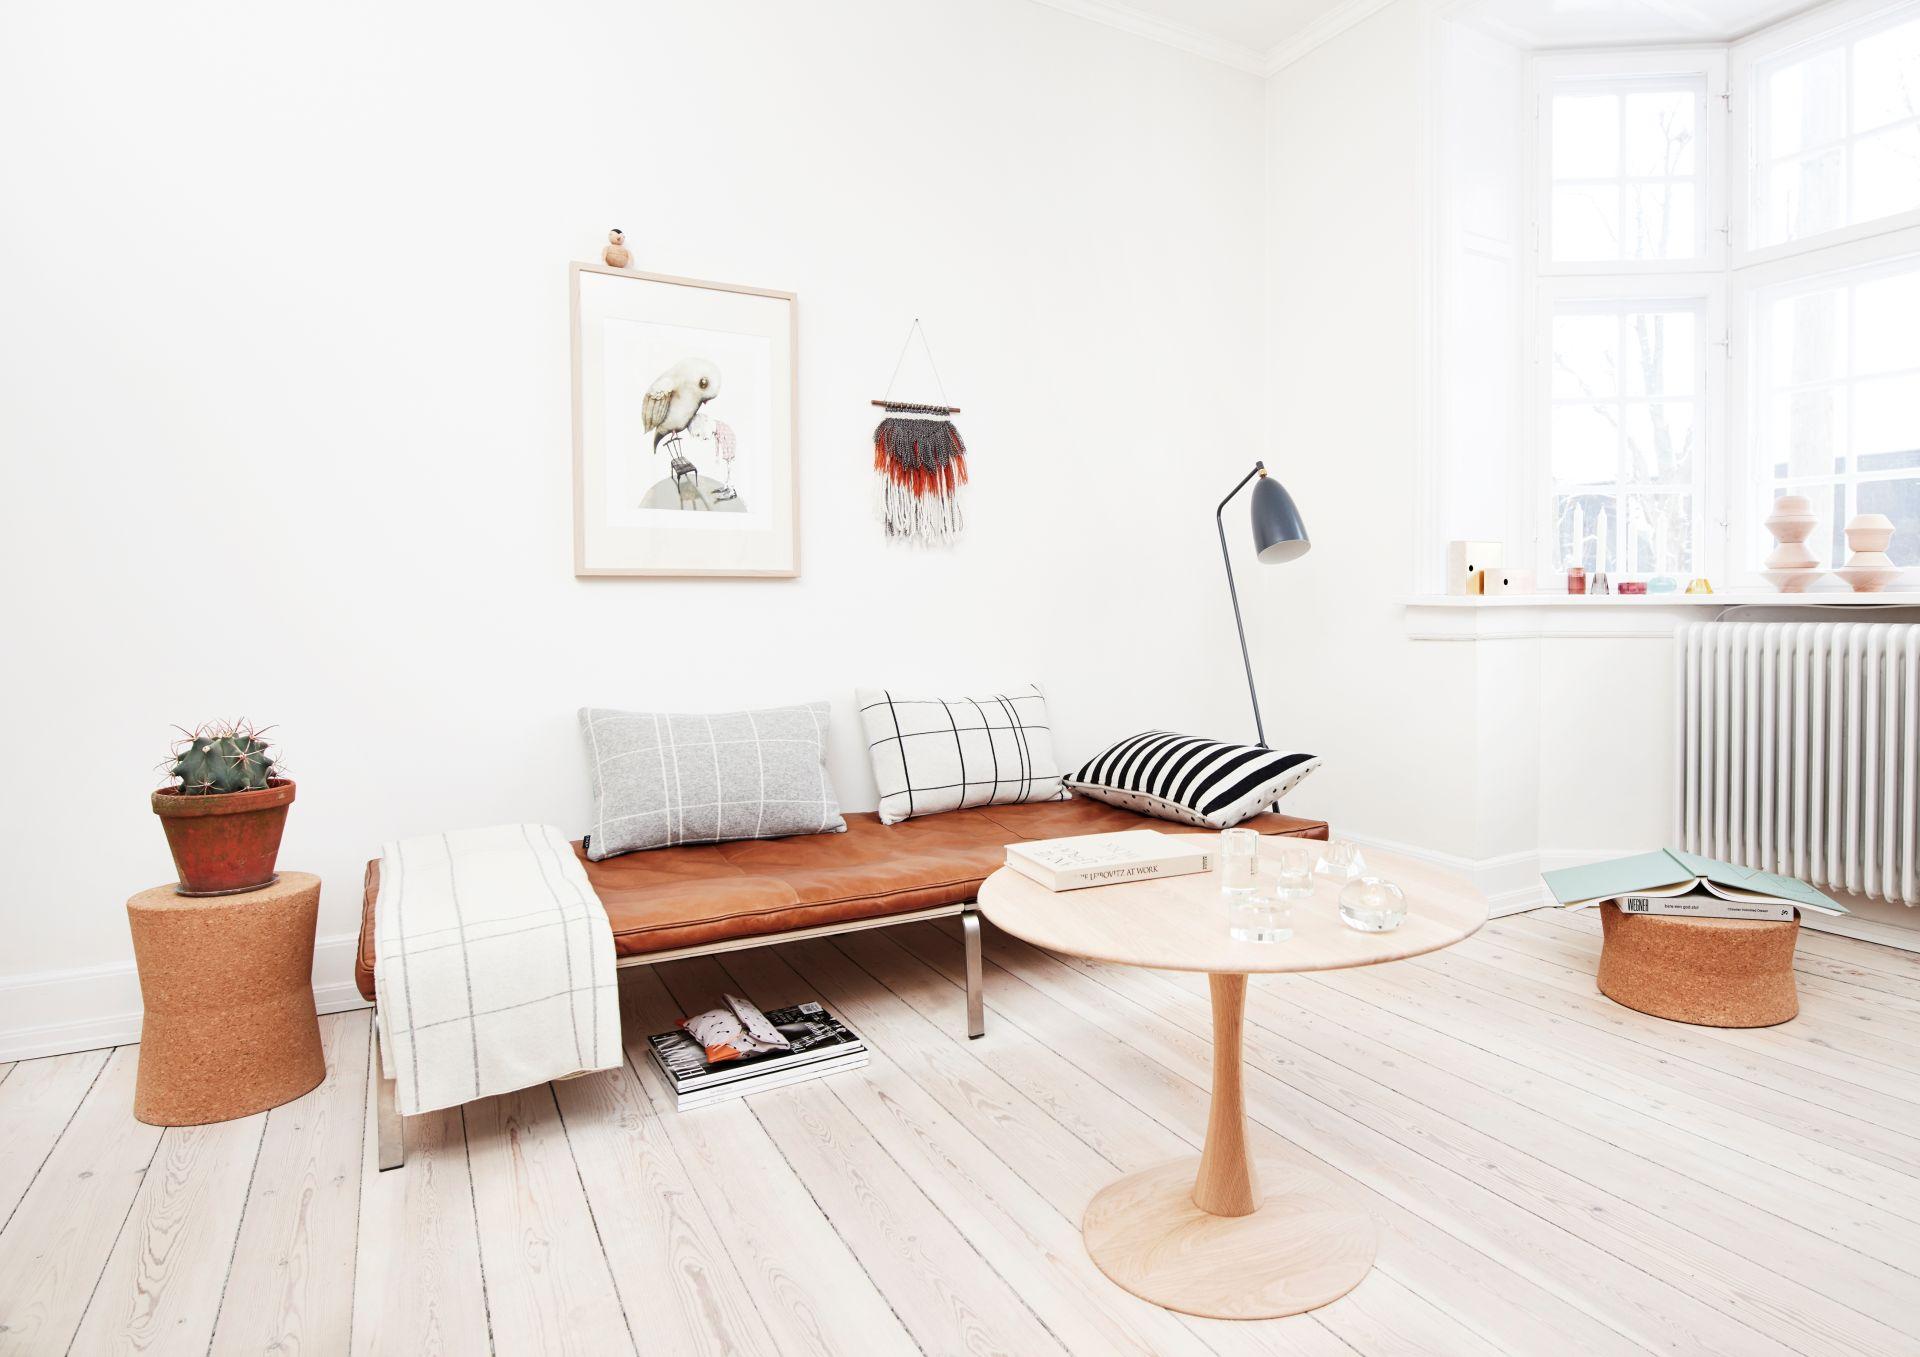 pleten p ehoz z ov vlny a nylonu edob ov nordic day. Black Bedroom Furniture Sets. Home Design Ideas